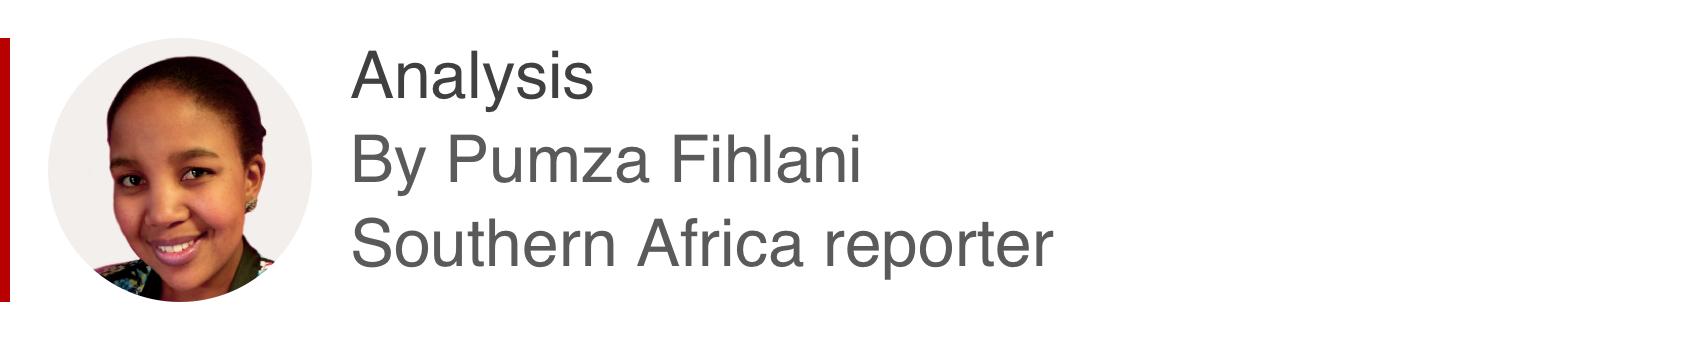 Analysis box by Pumza Fihlani, southern Africa reporter